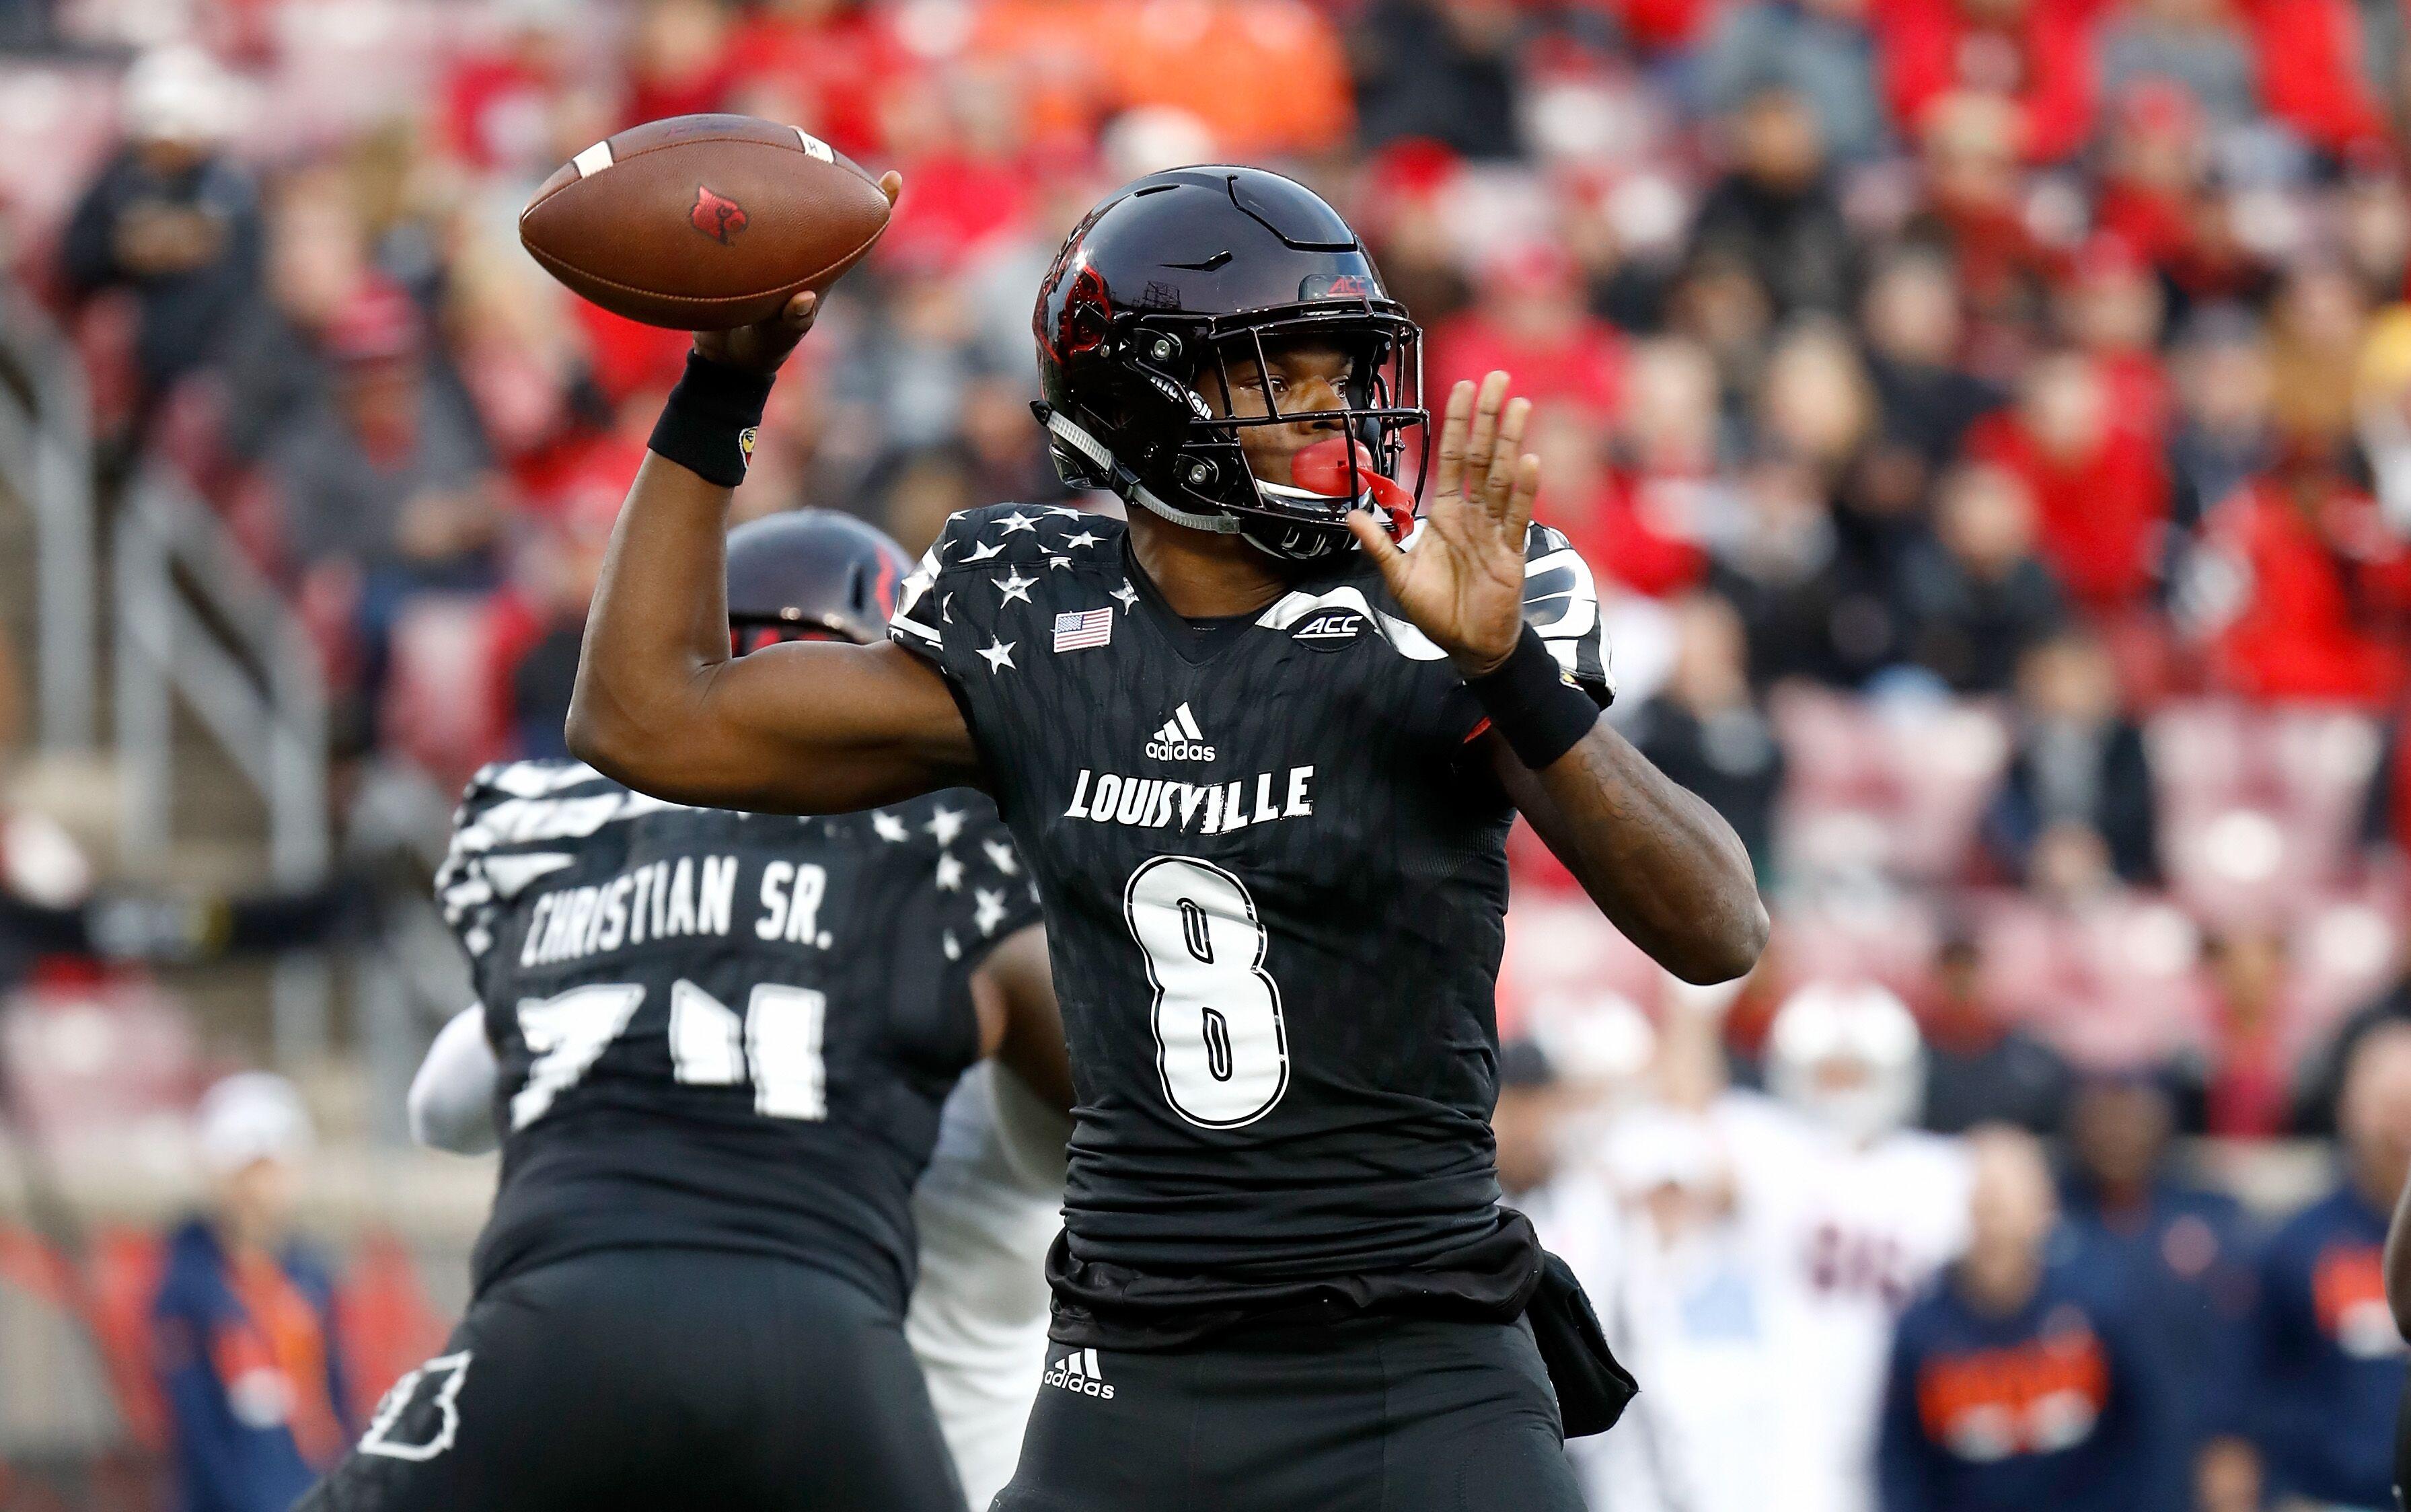 sale retailer 6c9b4 b2a3b 2018 NFL Draft: Lamar Jackson has ridiculous next-level ...